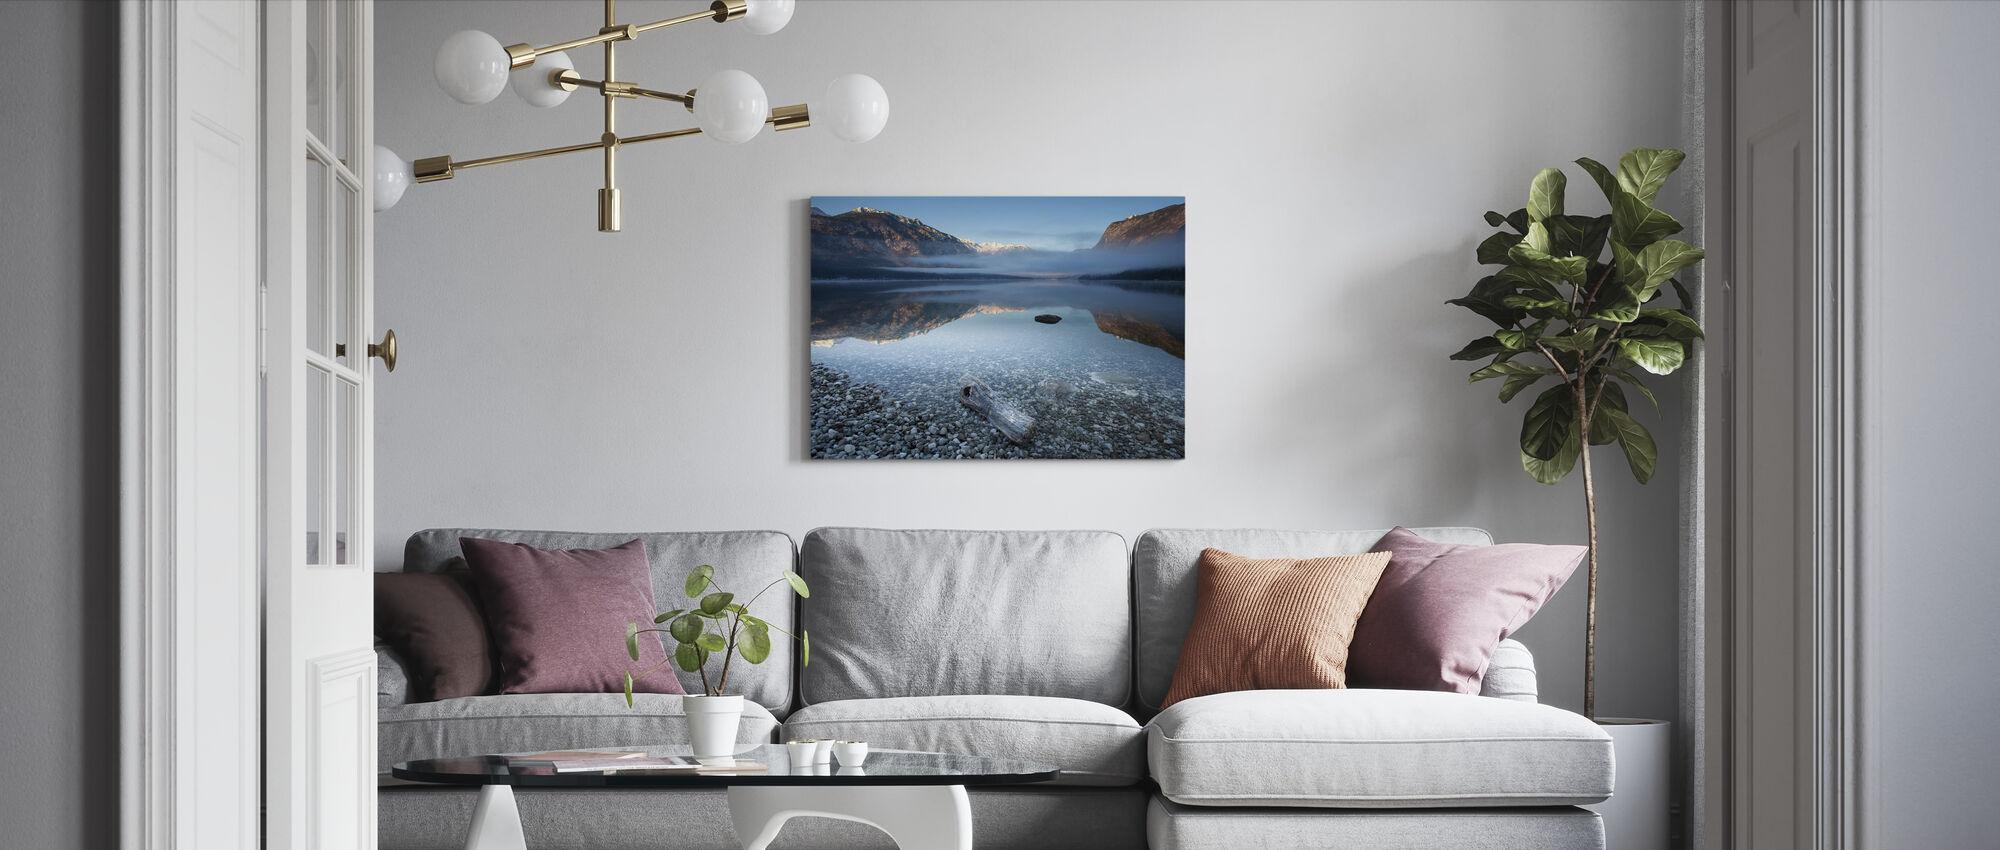 Bohinj's Tranquility - Canvas print - Living Room